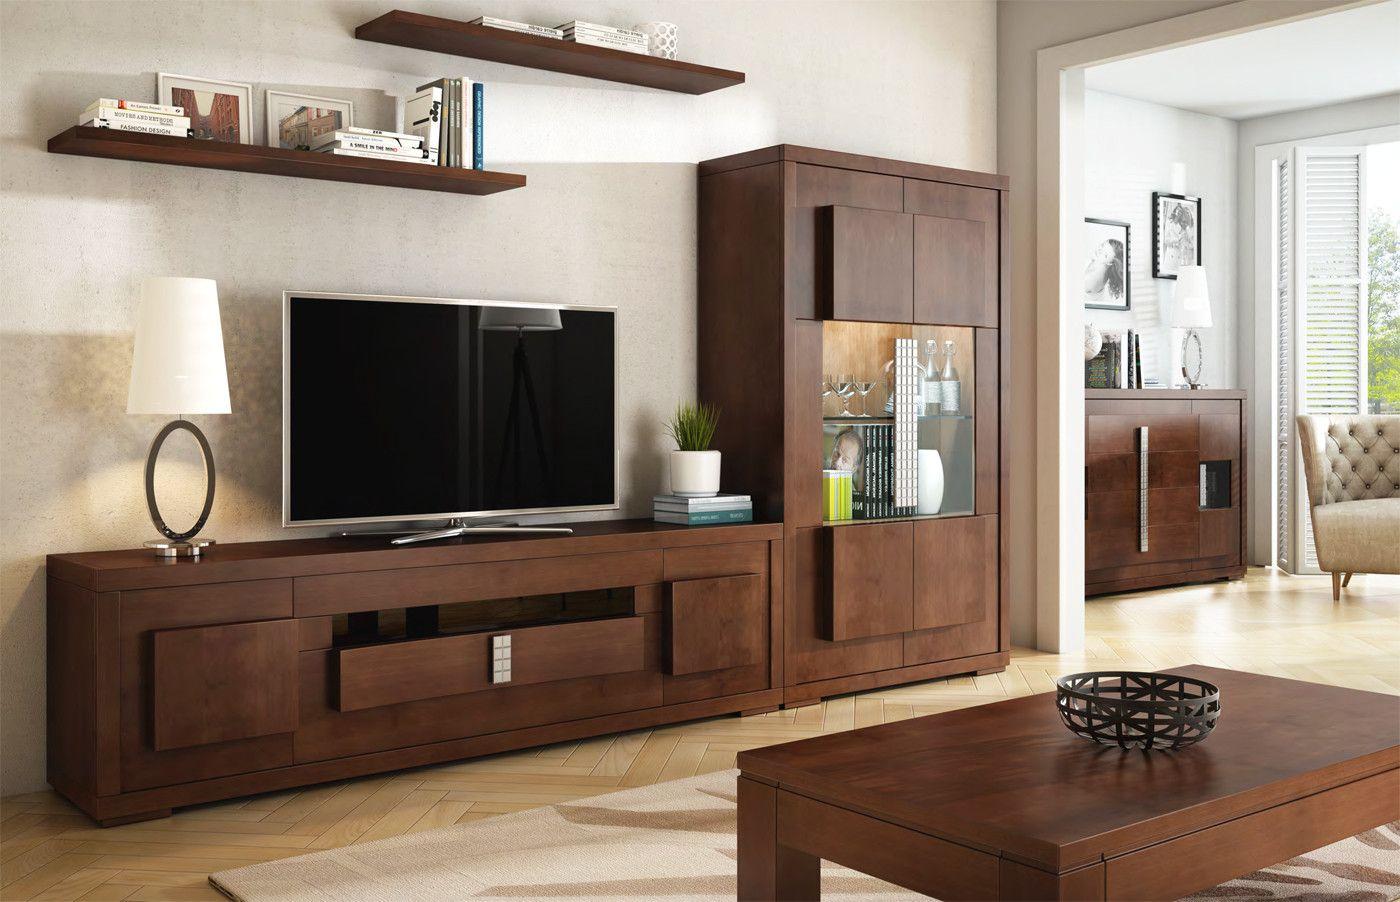 Muebles de dise o con iluminaci n led para sal n en 2019 - Diseno de salon ...